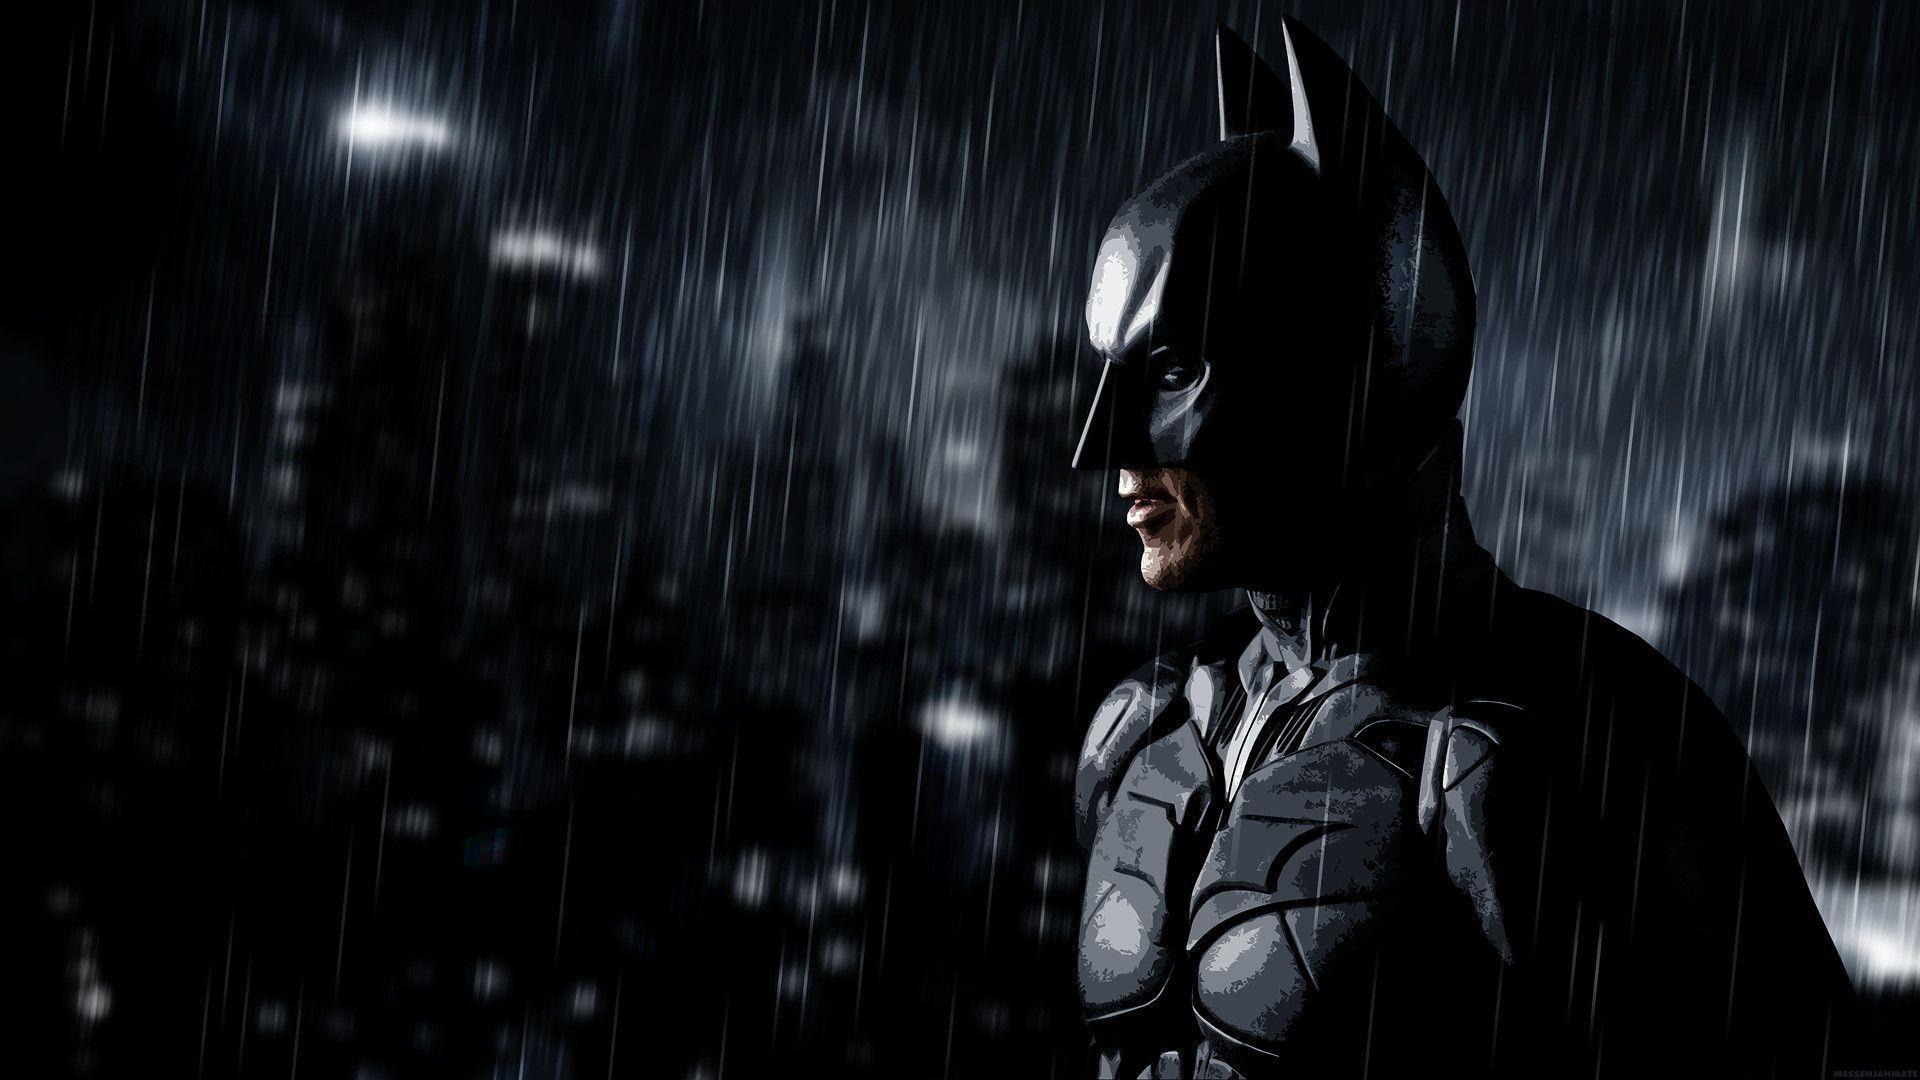 Batman Screensaver : Screen Wallpaper Munity Batman Wallpapers .